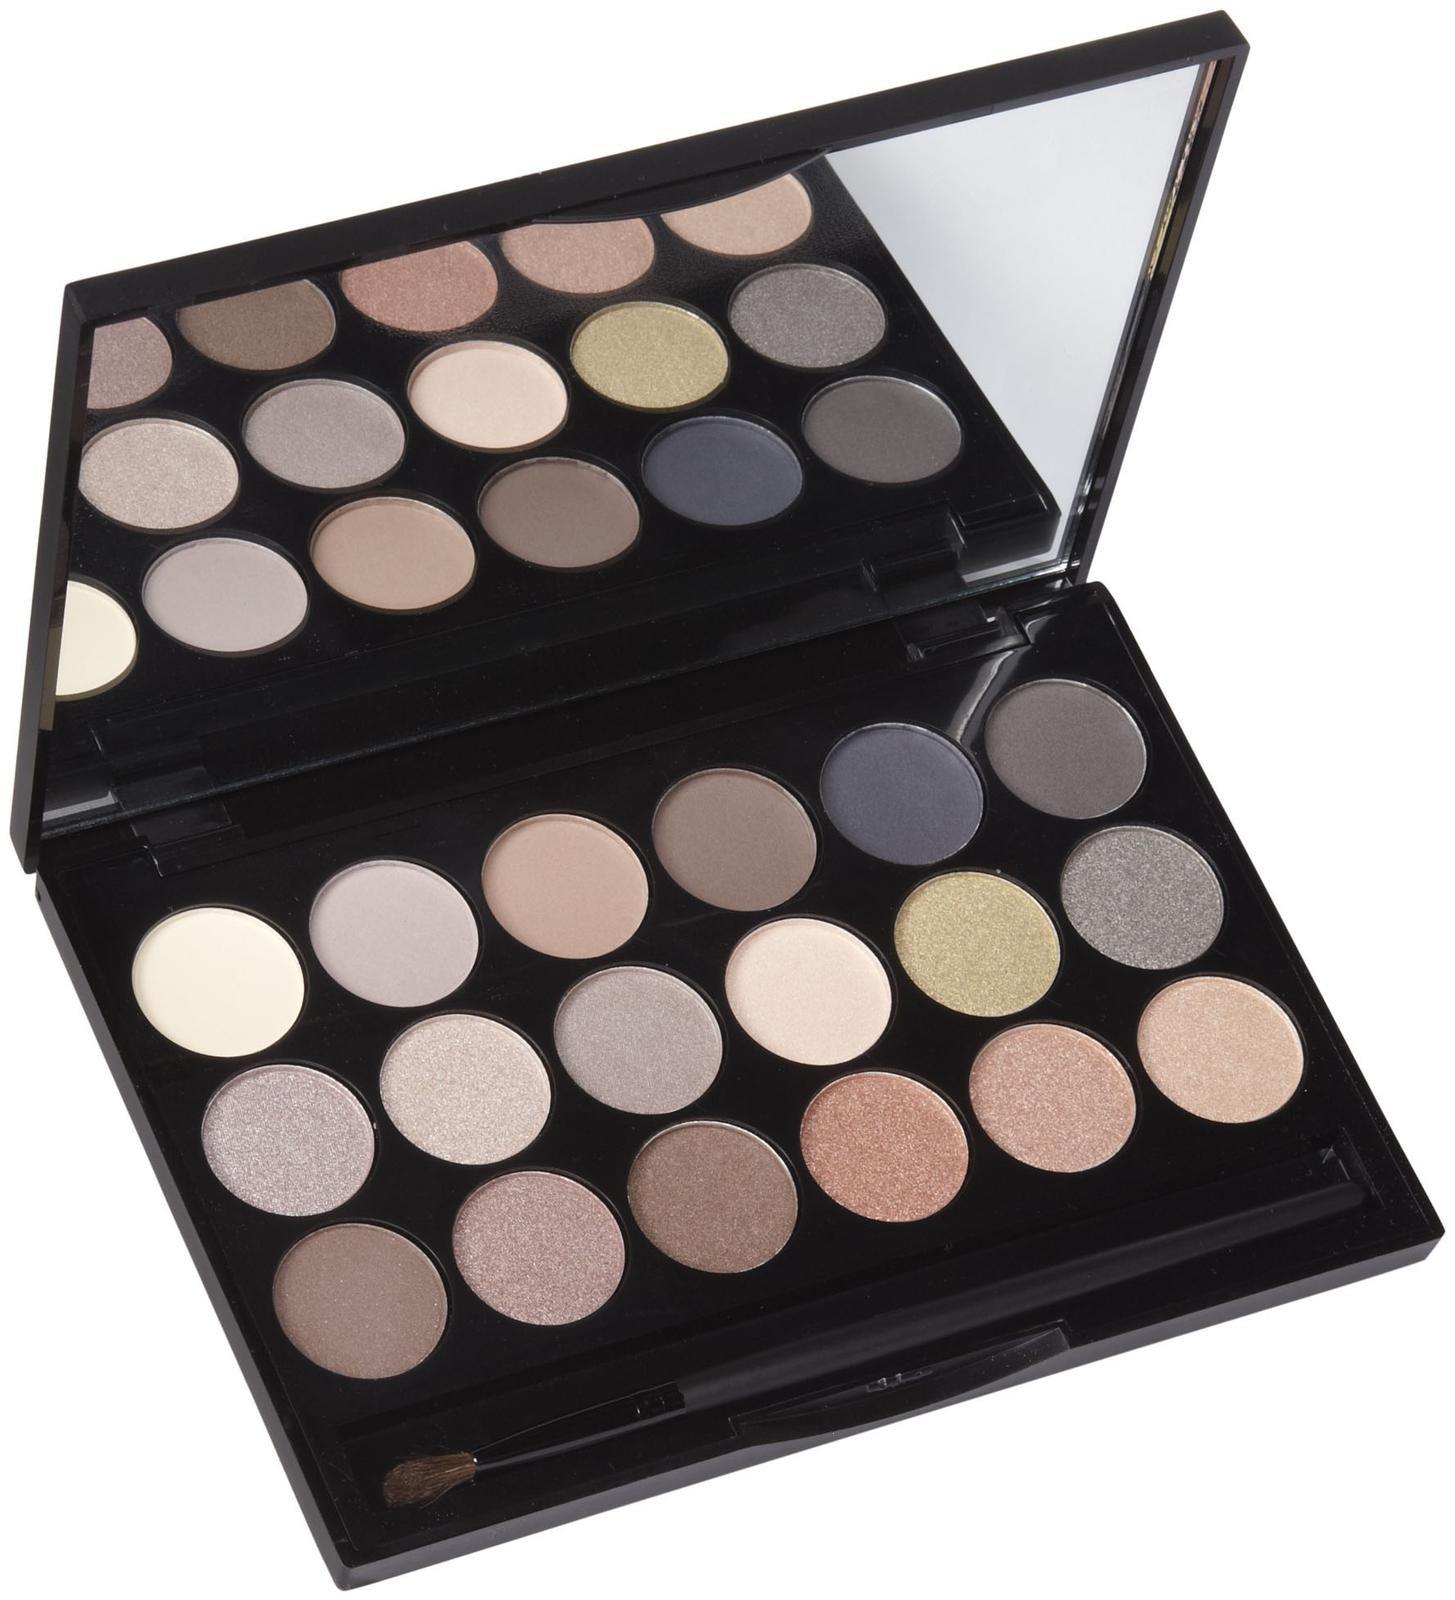 e.l.f. Essential Eyeshadow Palette with B